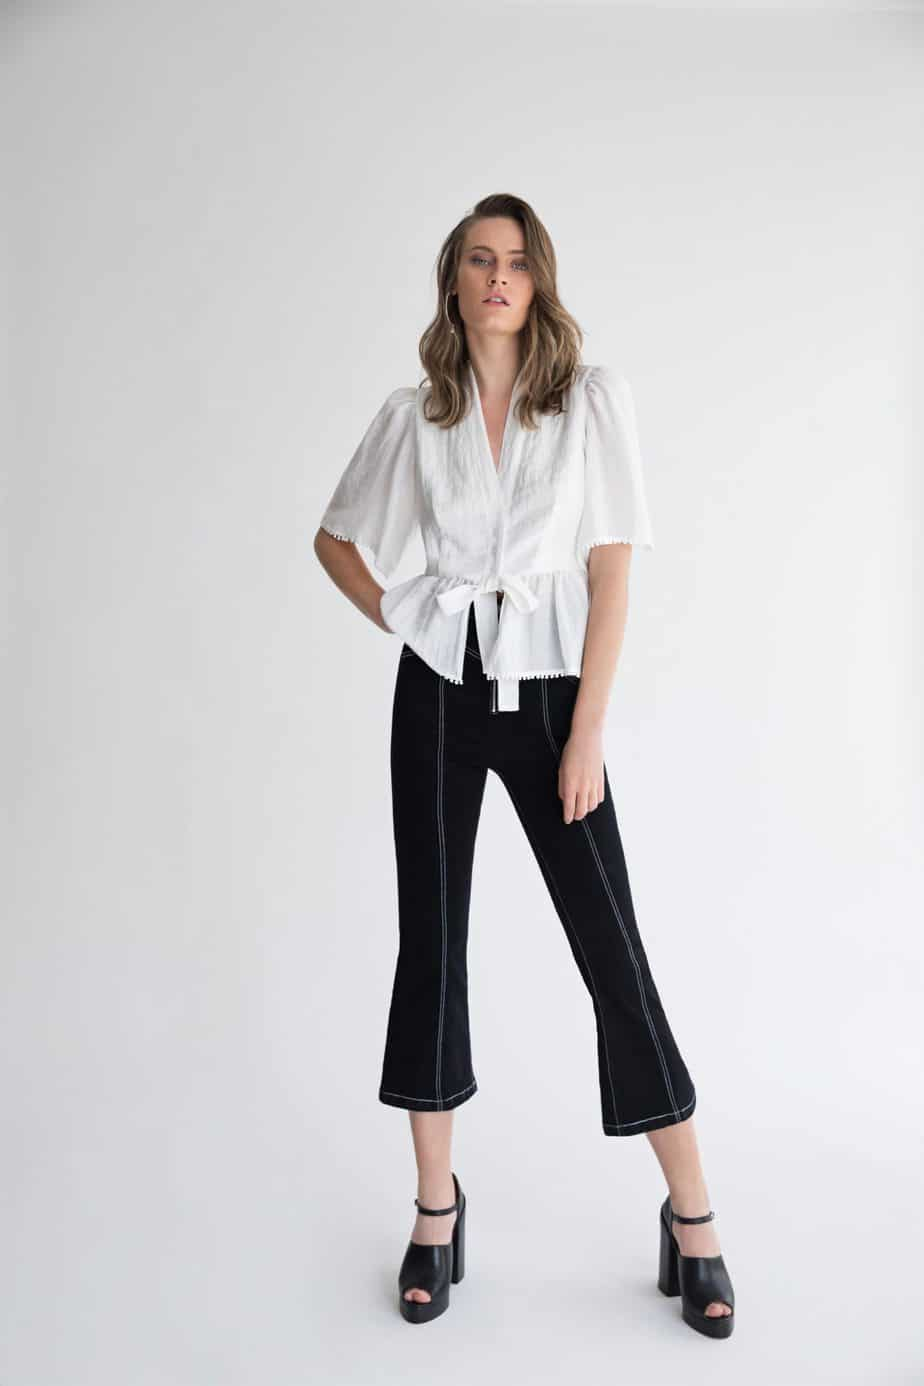 ---Sabina-Musayev-SS19-top-539-nis-jeans-780-nis-photo-Shay-Yahezkel --- Shopping ,Fashion ,Trends, Fashion Magazine, מגזין אופנה ישראלי, חדשות אופנה, חדשות יופי, כתבות אופנה, אופנה ישראלית, עיצוב אופנה, צילום אופנה, הפקות אופנה